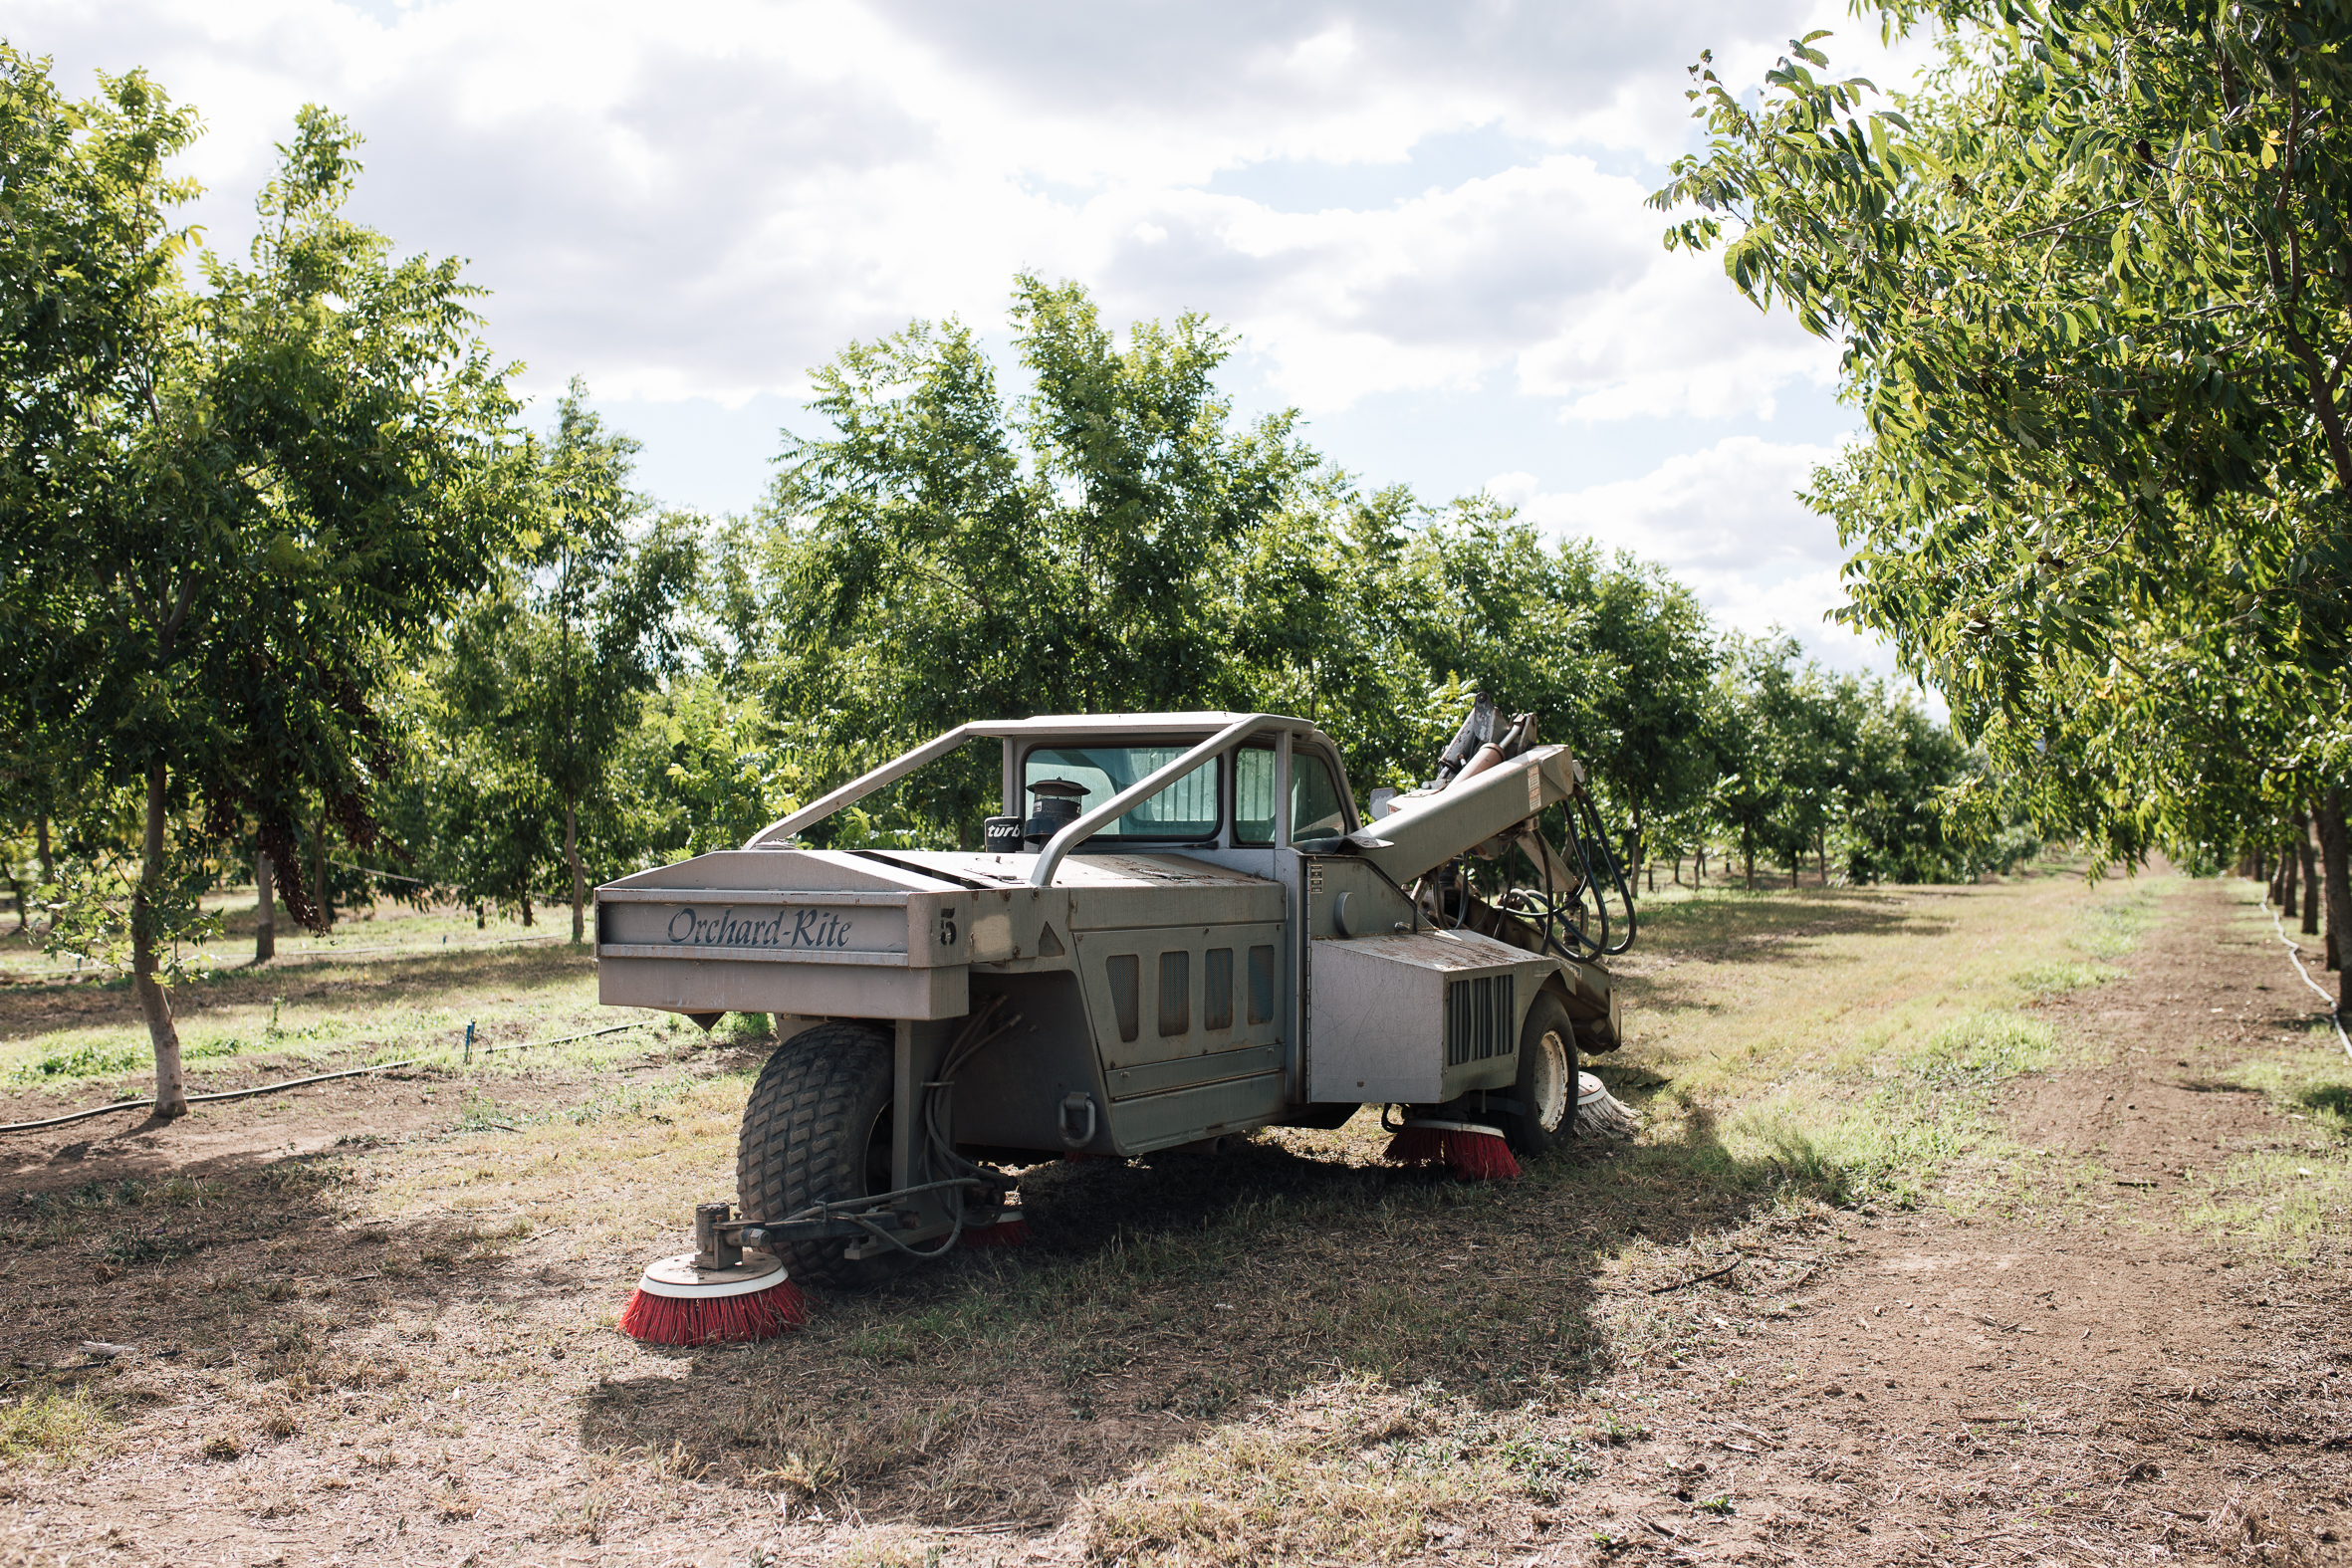 The pecan tree shaker